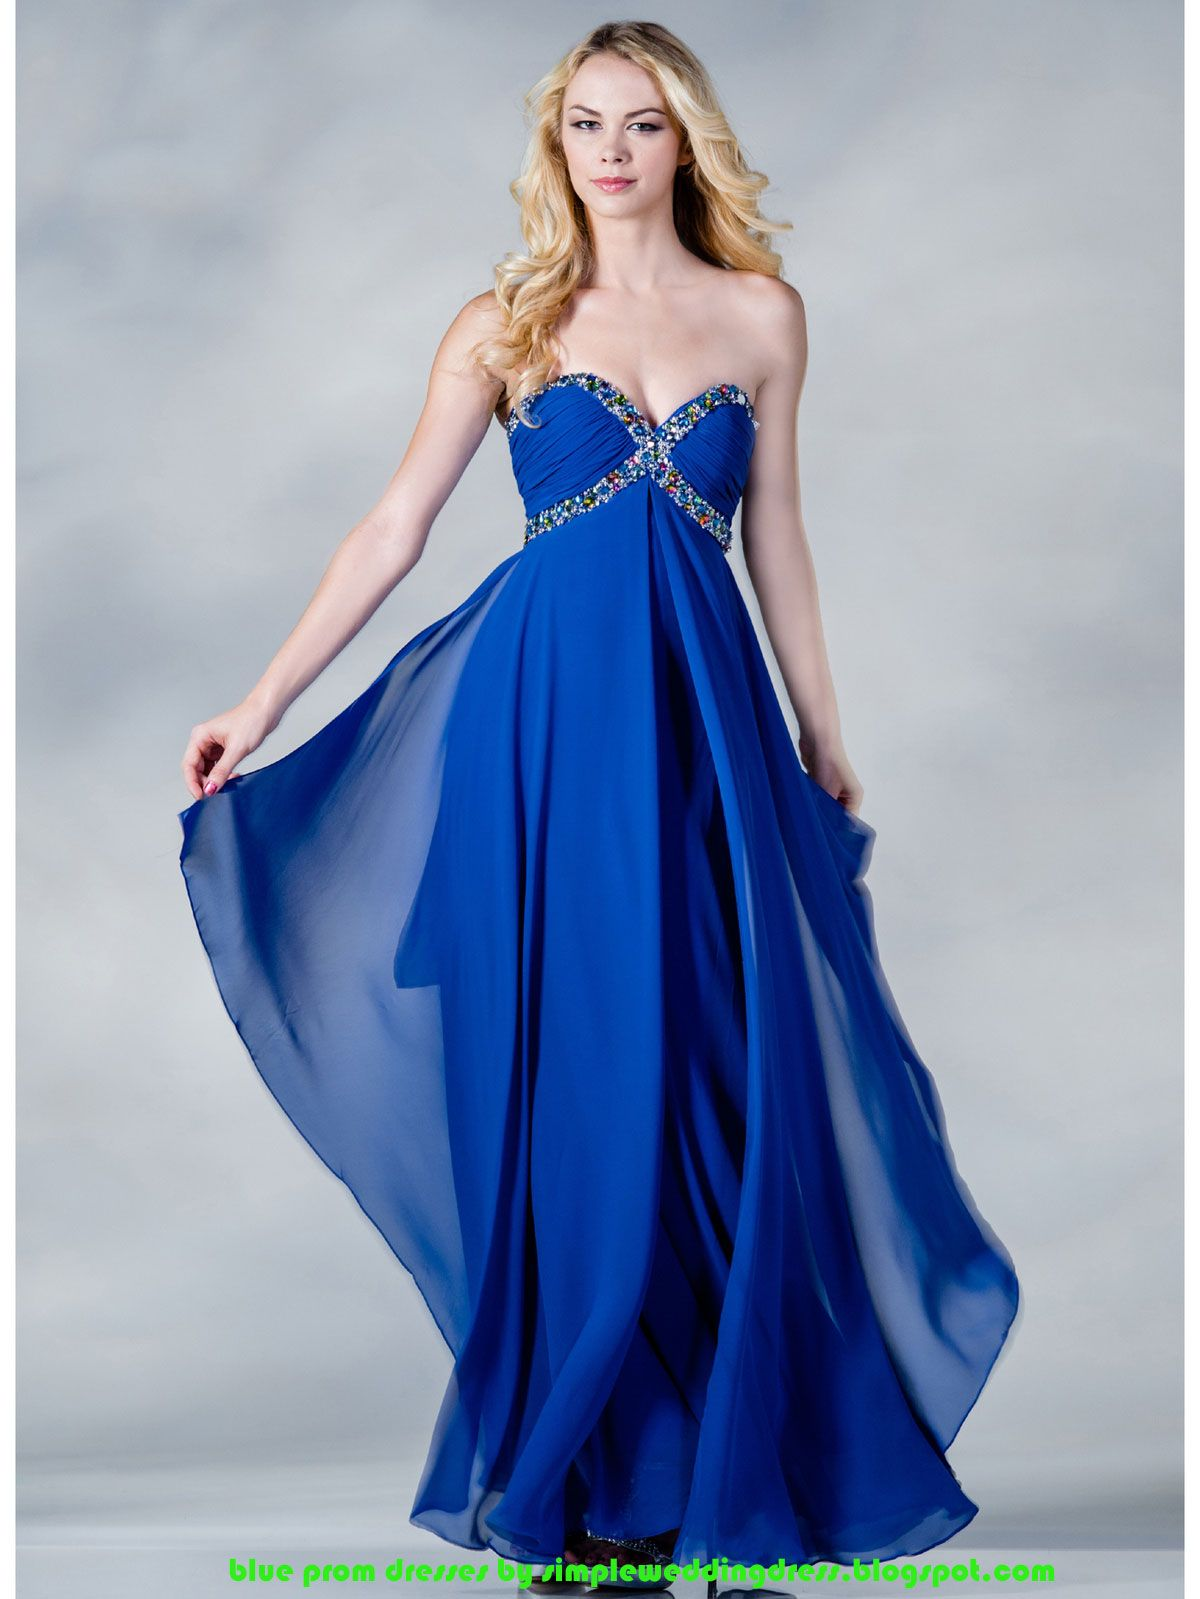 Buy blue prom dresses in low price off see on simpleweddingdress